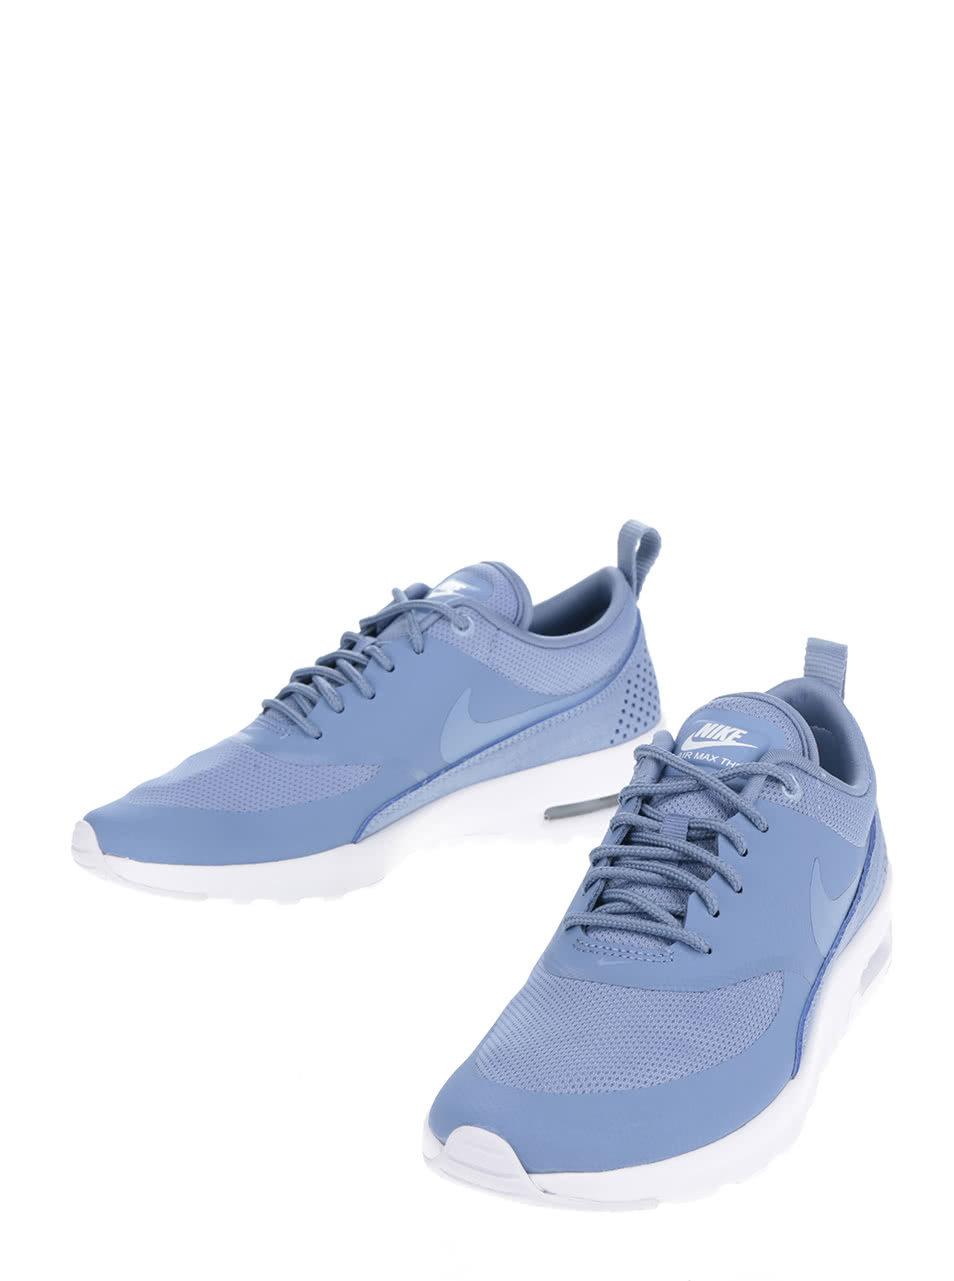 749a14559e Světle modré dámské tenisky Nike Air Max Thea ...